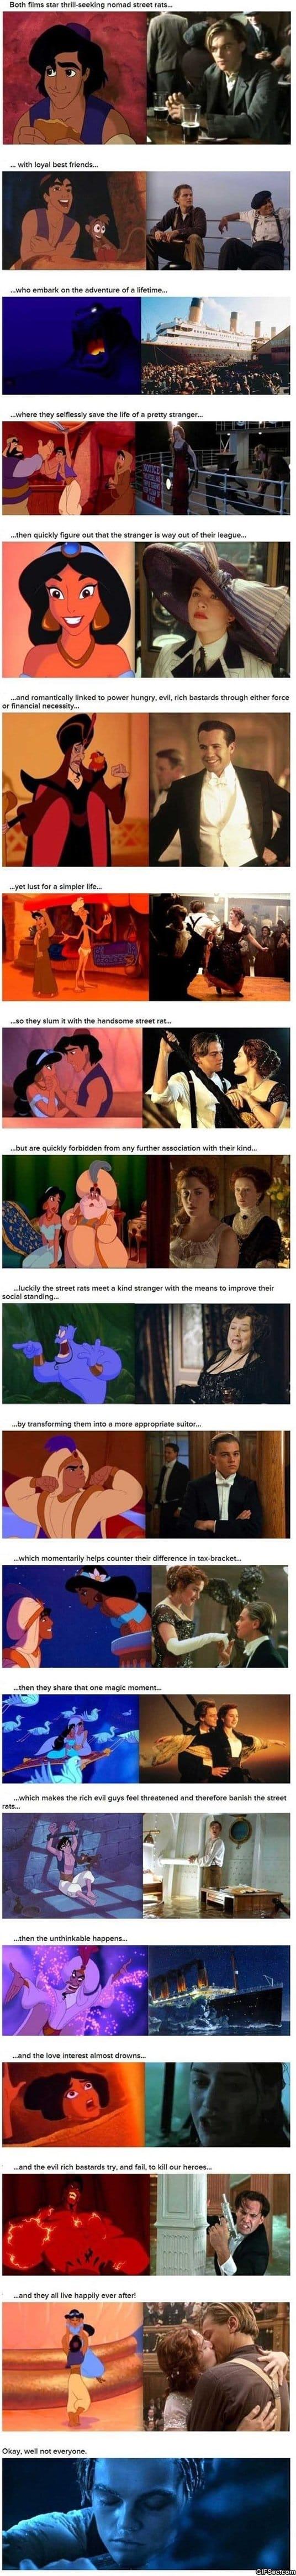 lol-aladdin-vs-titanic